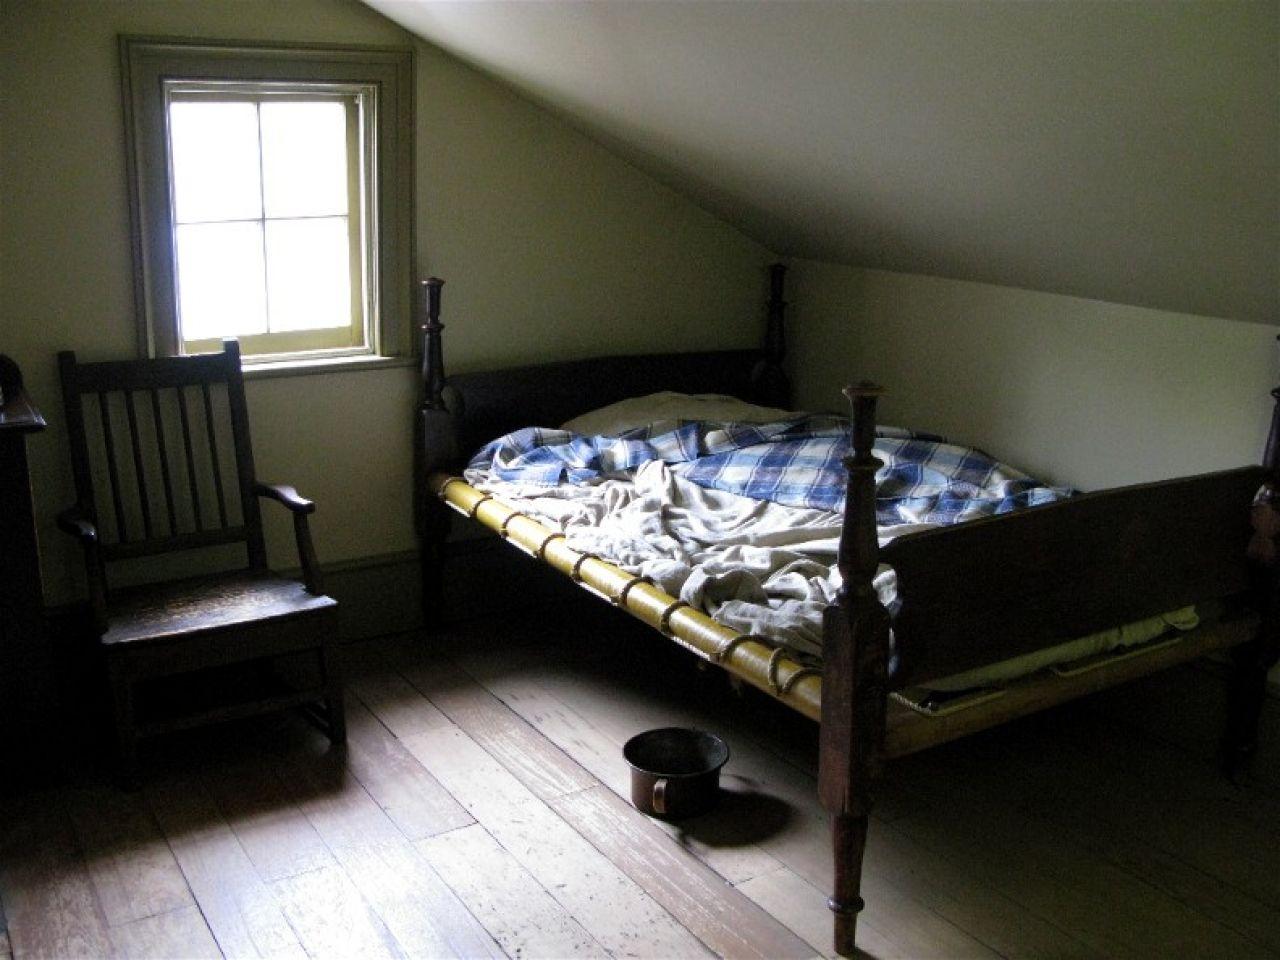 Small Old Bedroom old-timey-bedroom-ideas-old-dark-bedroom-cbdb0c3fd394f12c